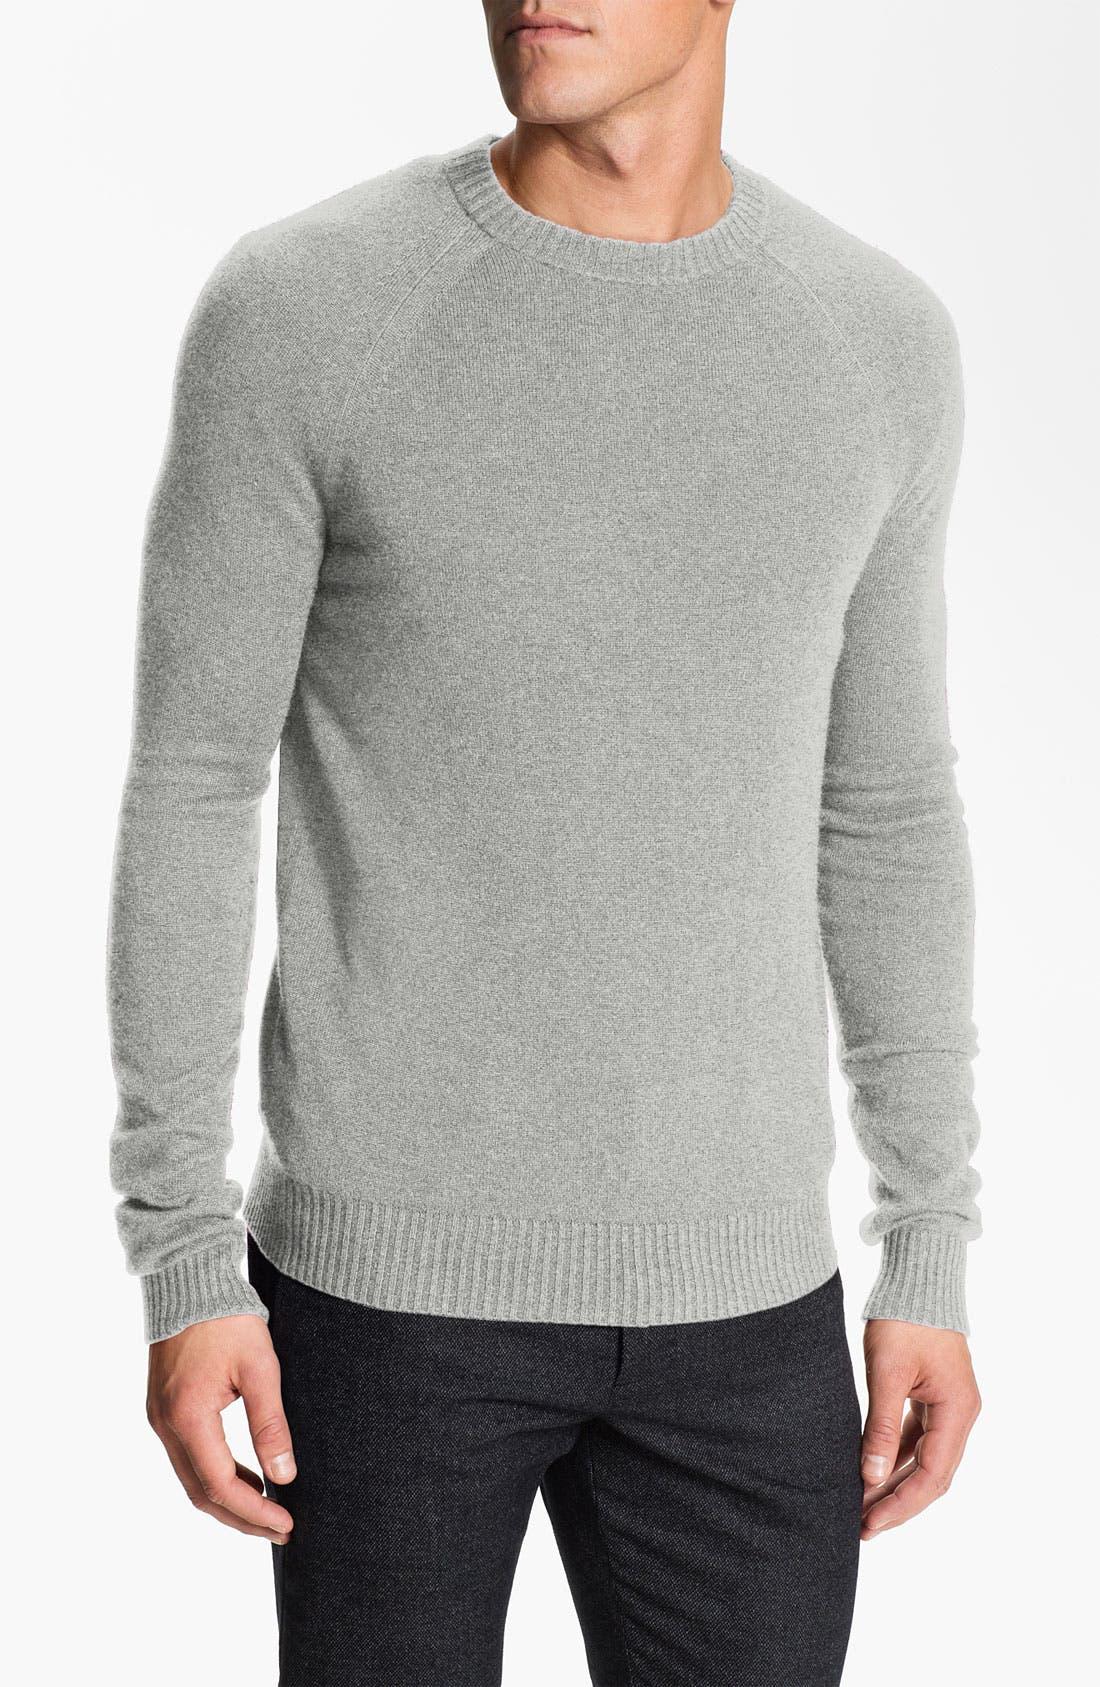 Main Image - Theory 'Lorenz' Cashmere Crewneck Sweater.